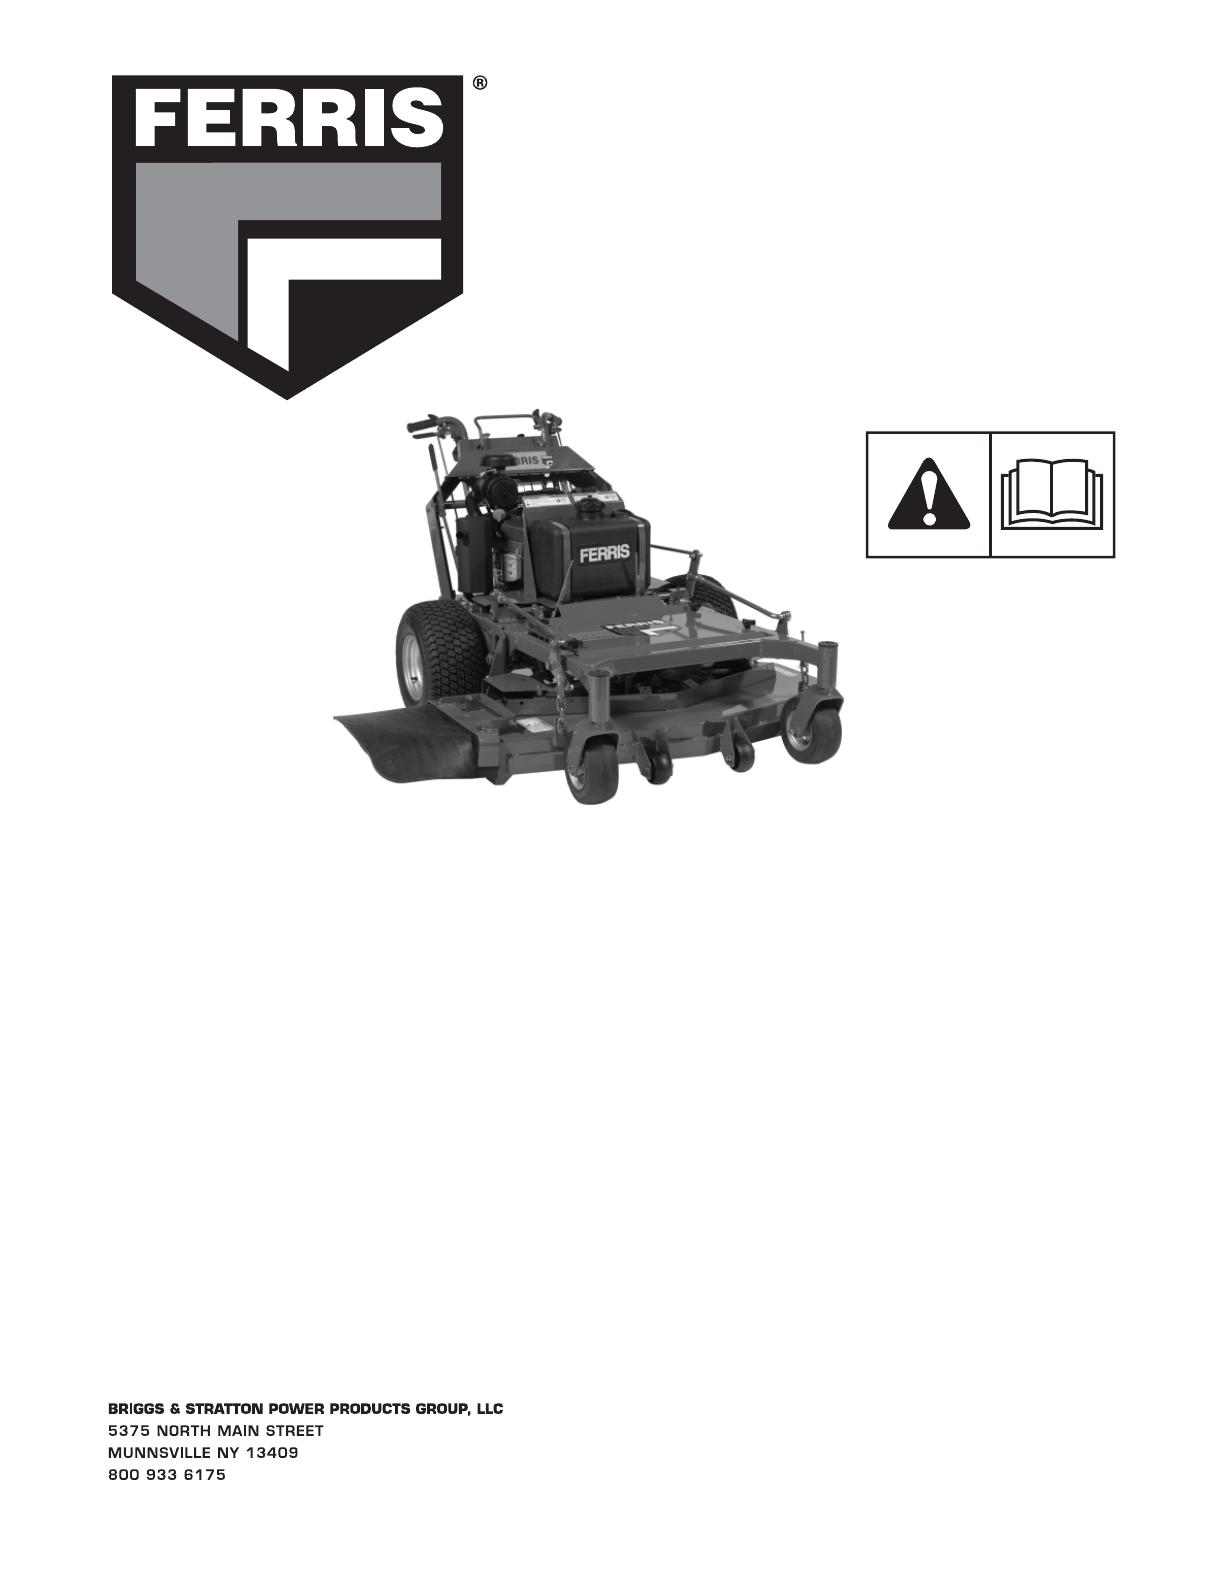 Ferris Industries Lawn Mower 5900637 Users Manual 5100647 T English Cvr Seat Switch Wiring Diagram